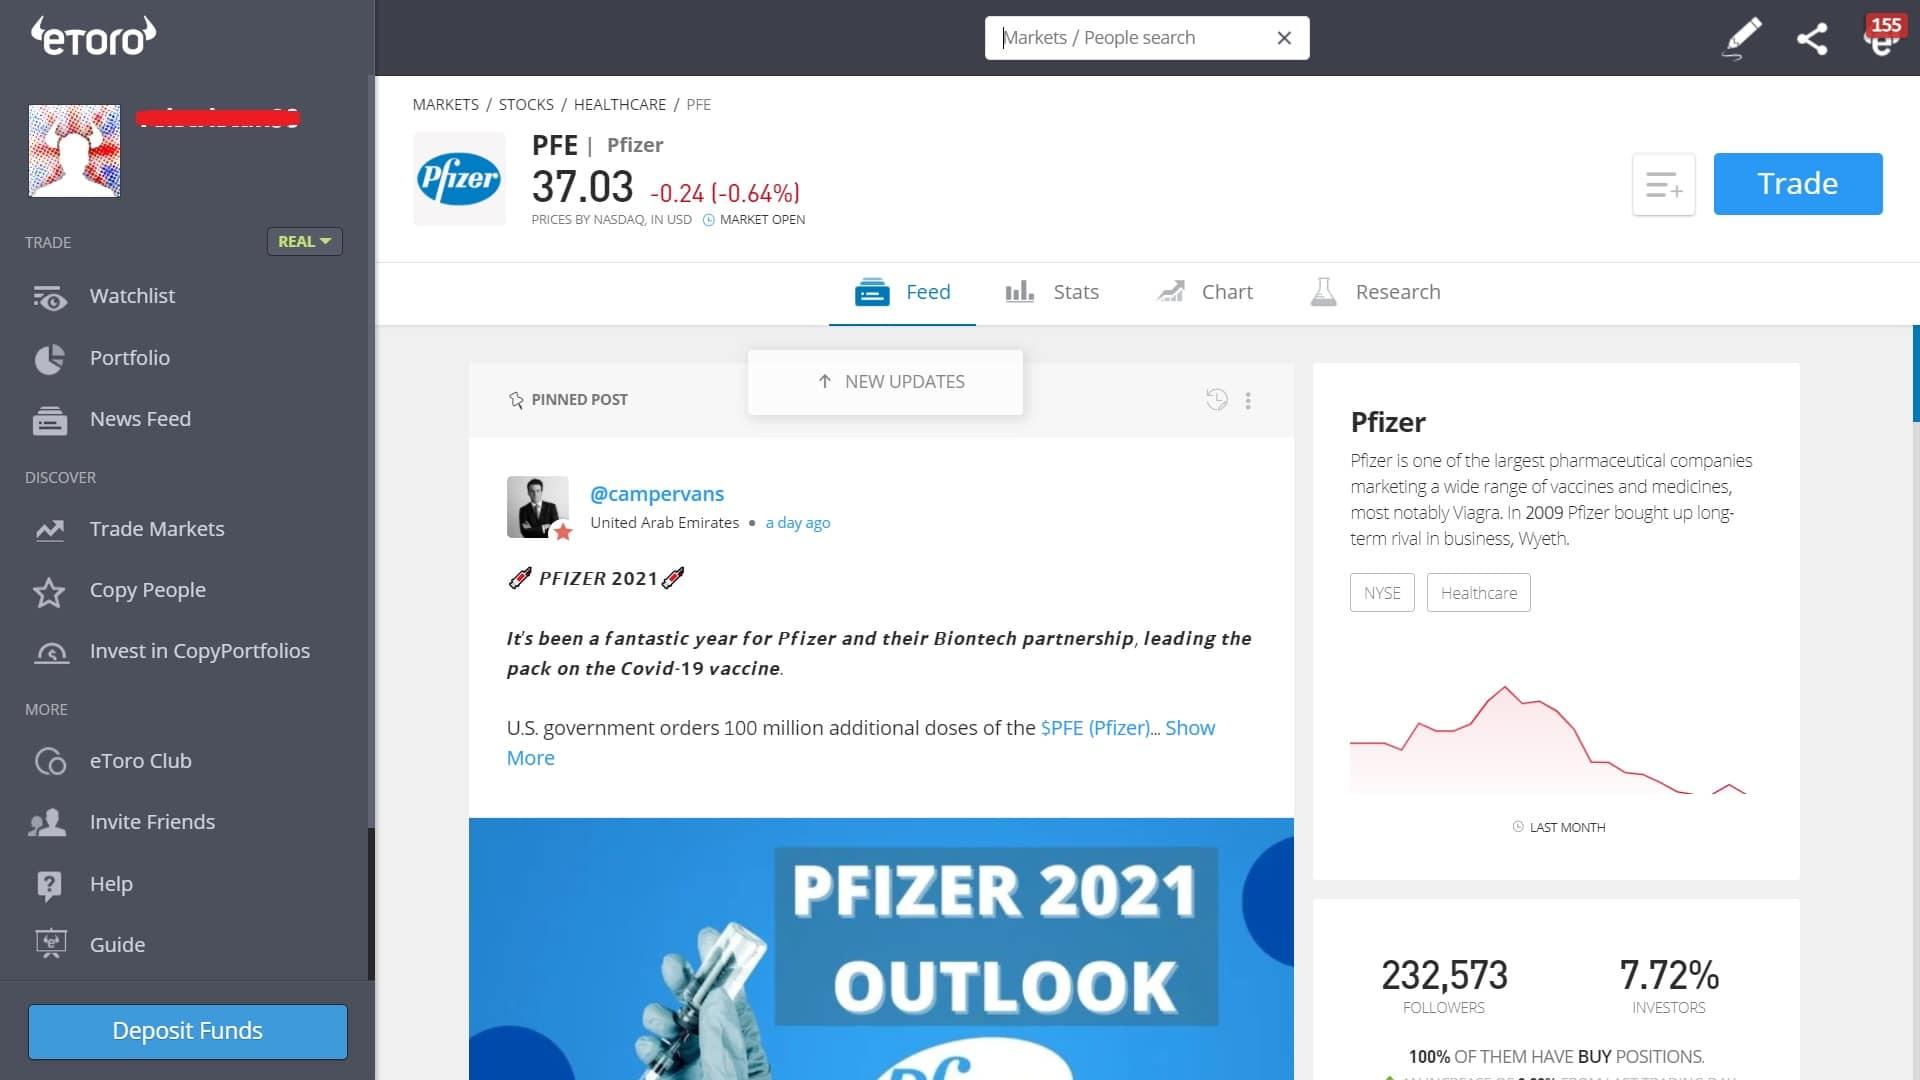 Pfizer stock trading on eToro's platform